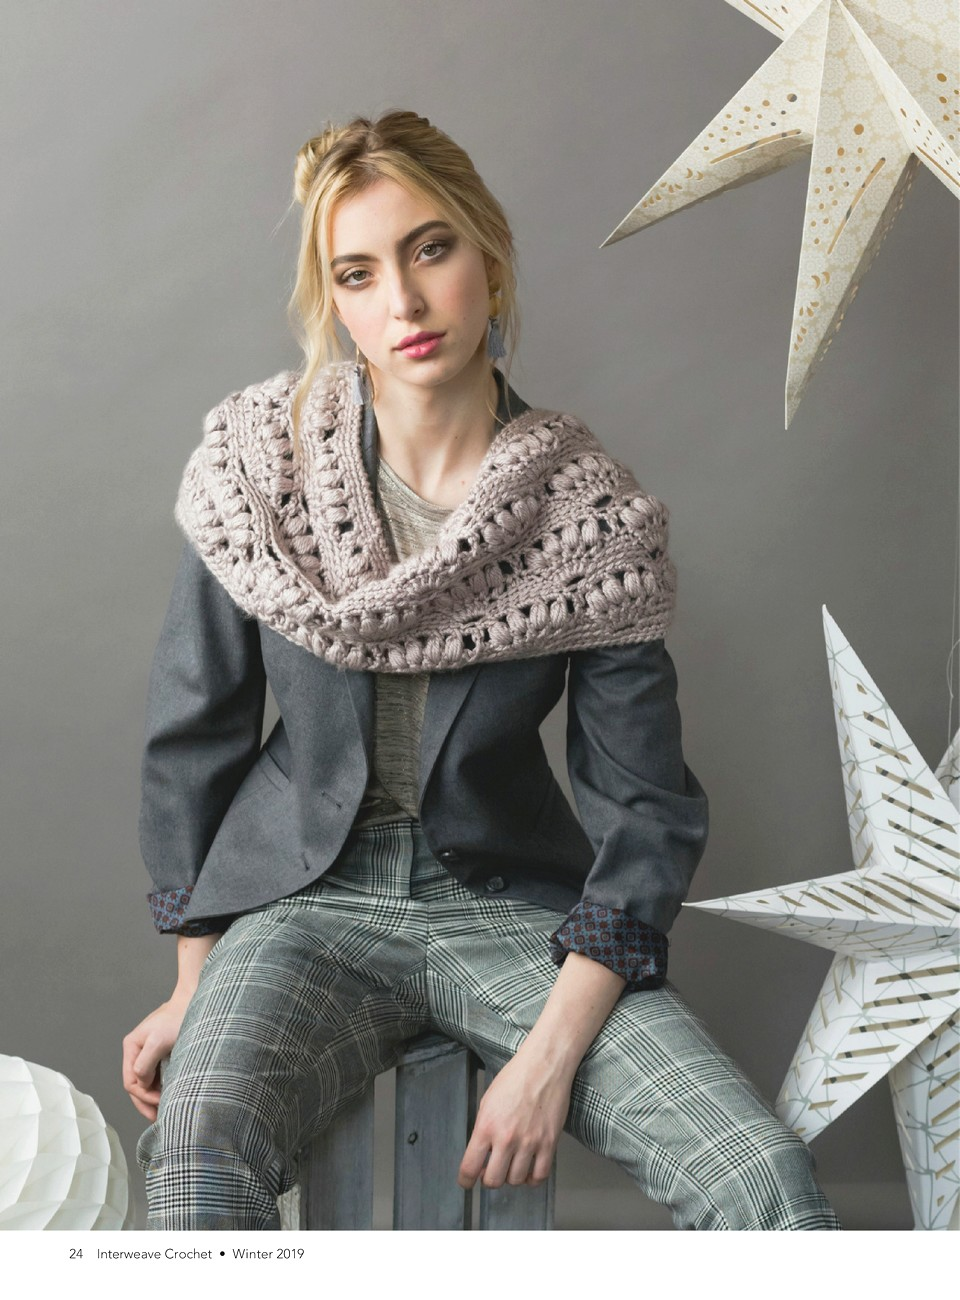 Interweave Crochet Winter 2019-25